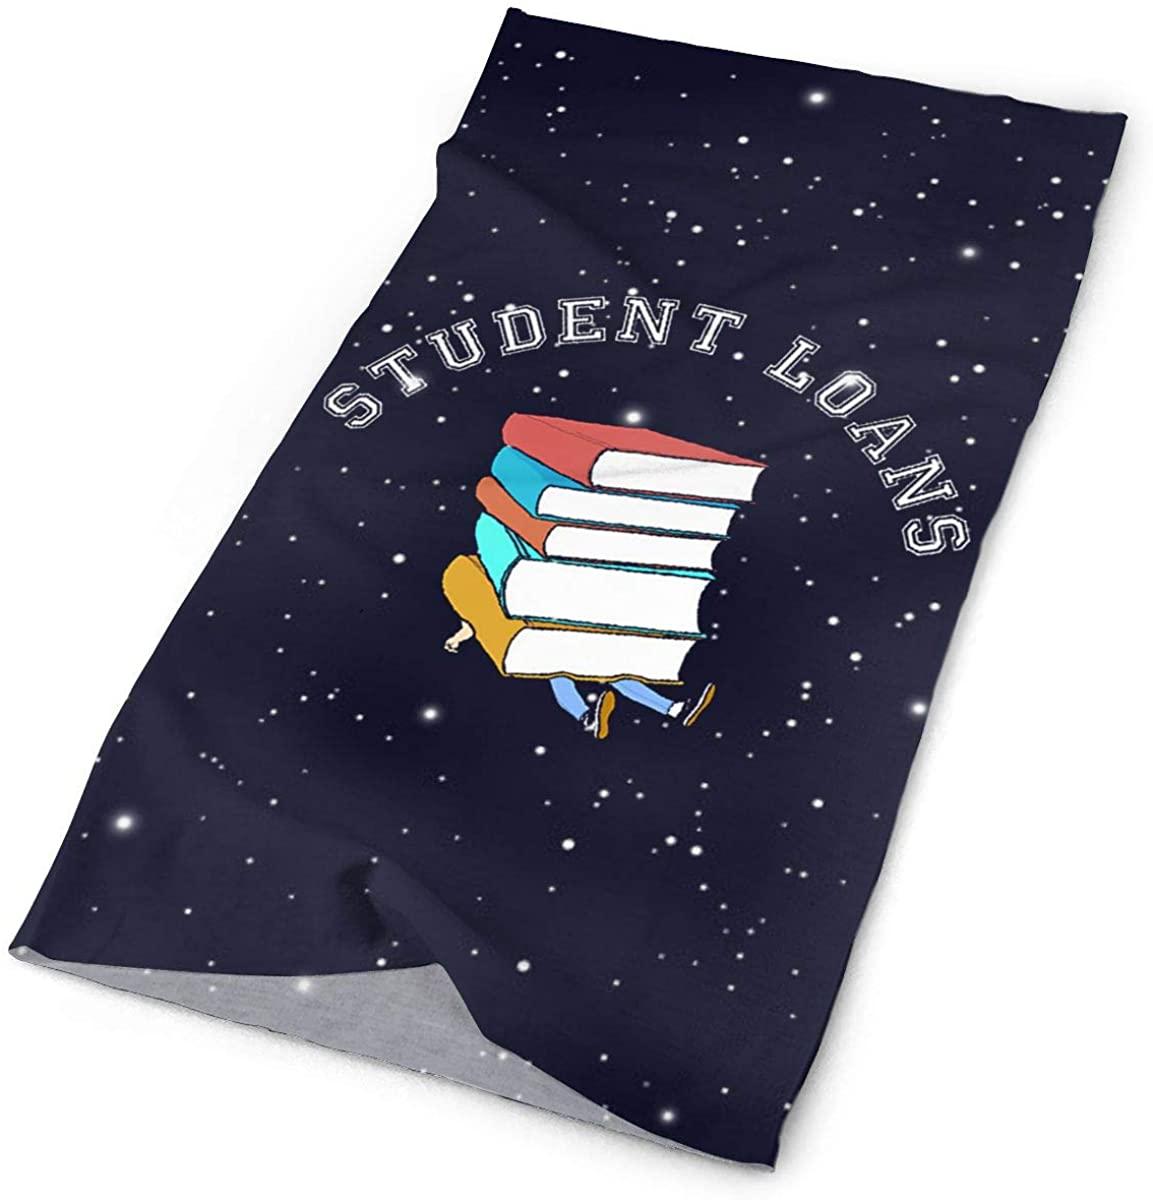 Student Loans University. Beach, Bike, Cross-Country, Mountain Climbing, Rock Climbing, Skiing, Travel, Fitness Towel